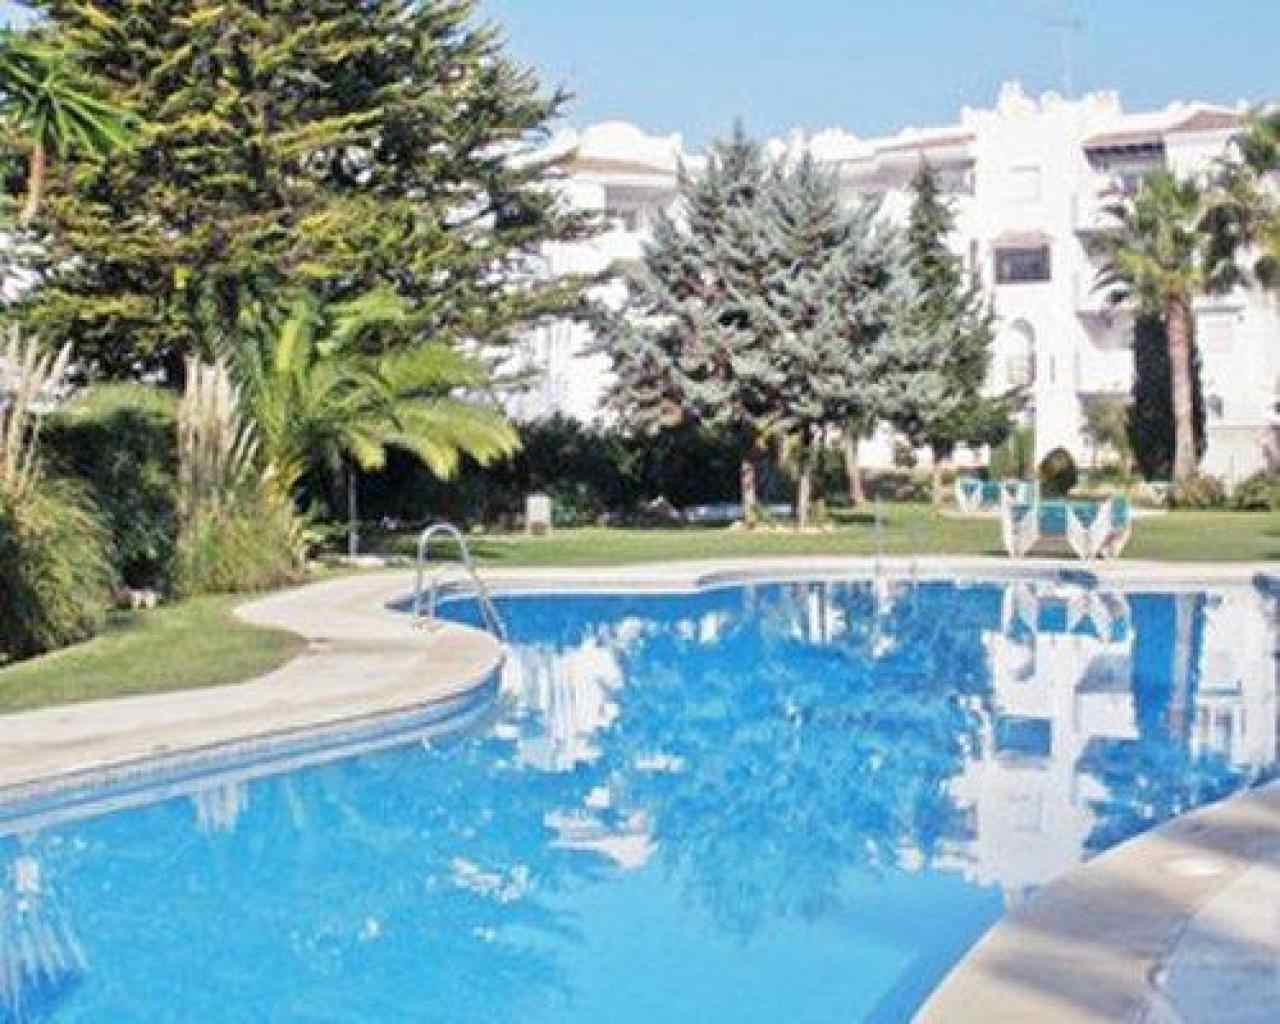 Alquiler de apartamentos Mijas, Málaga